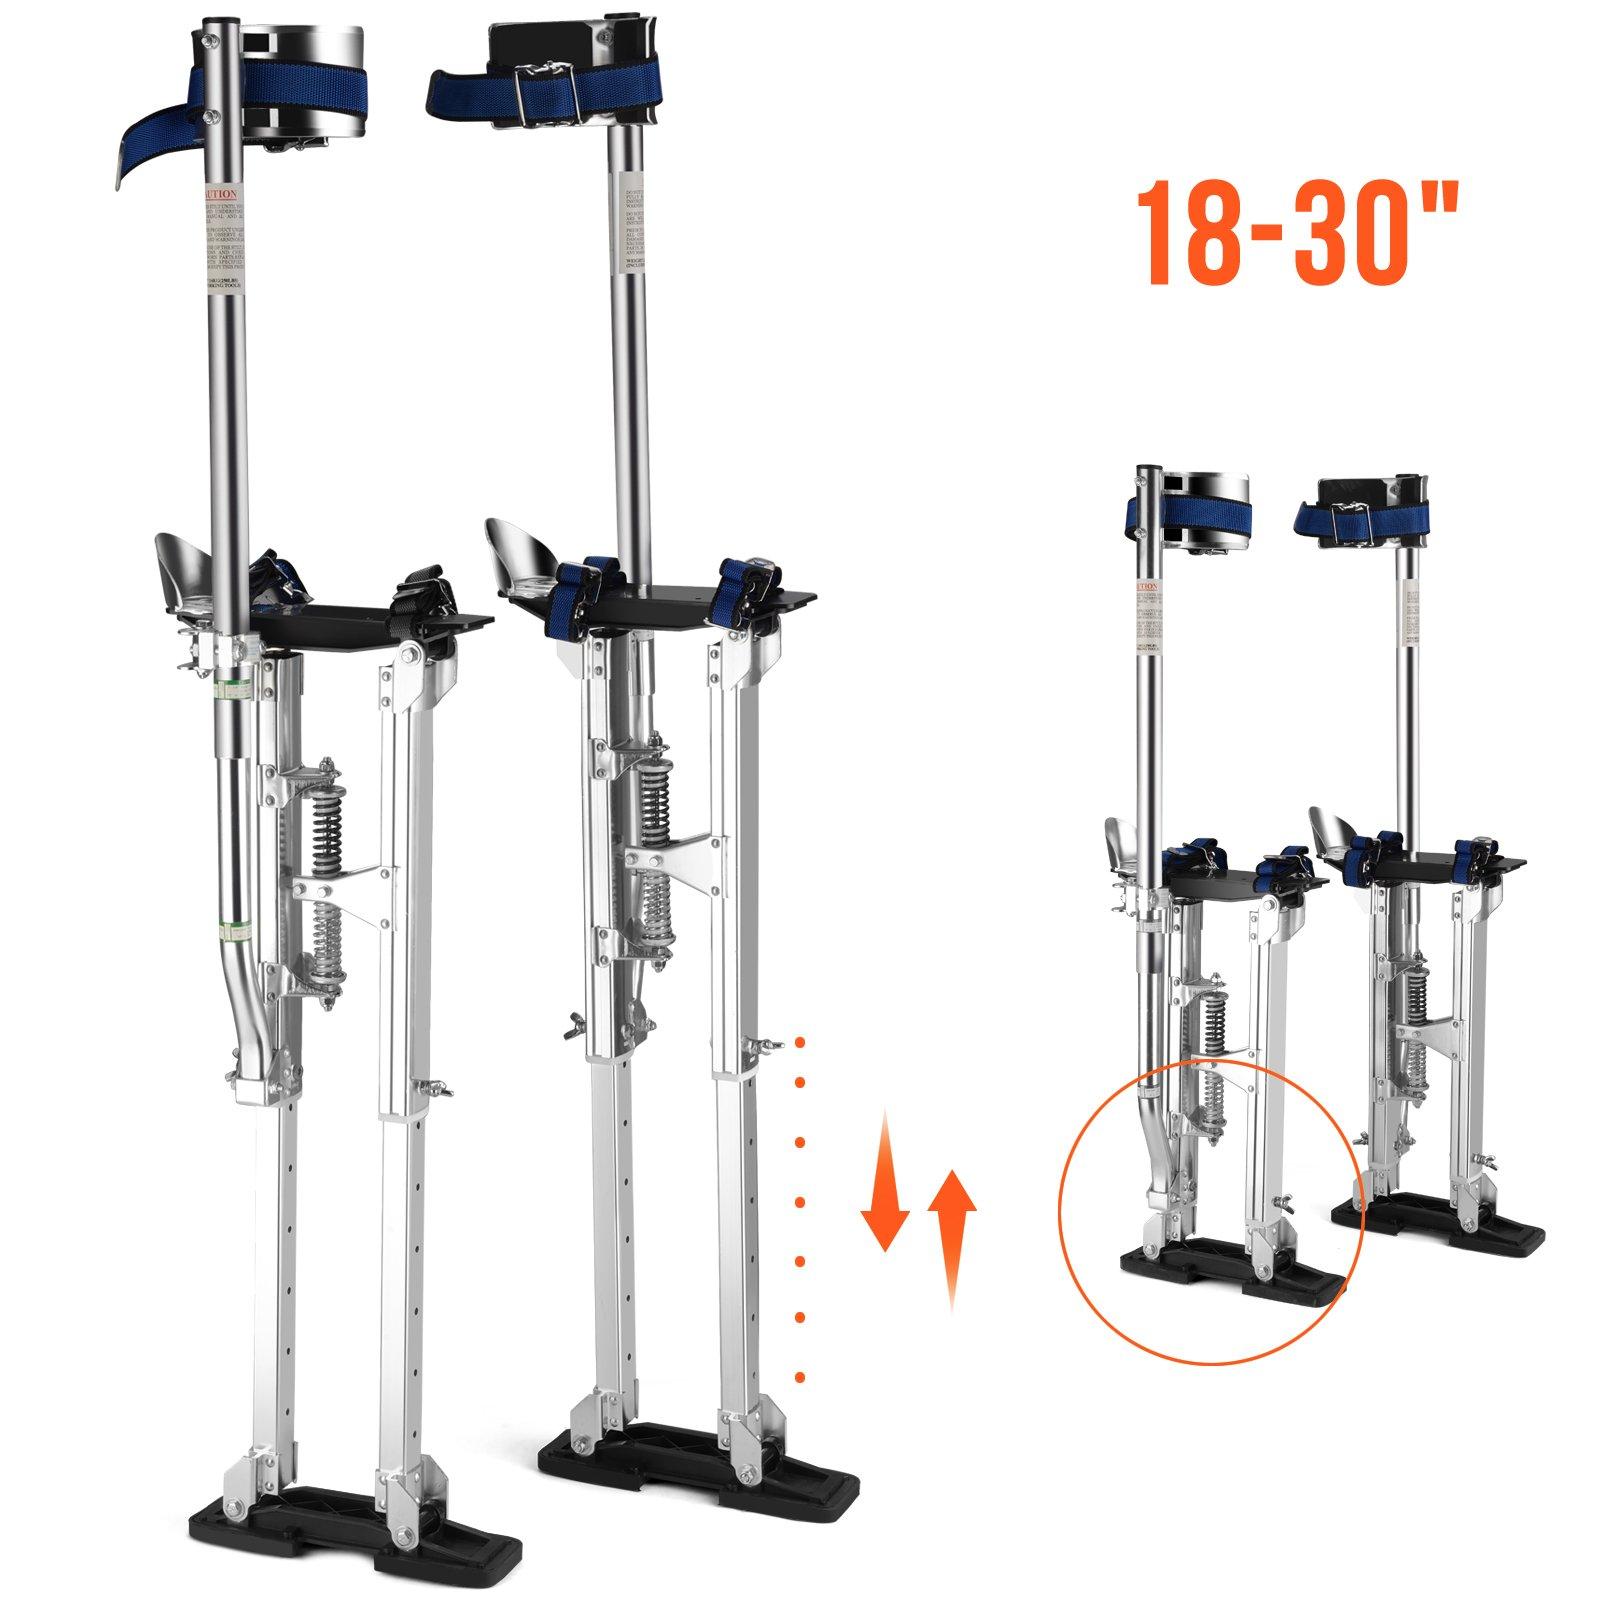 SUNCOO 18''-30'' Heavy-Duty Drywall Stilts Aluminum Tool Stilt Painter Taping Walking Finishing,330lb s. Load Capacity, Adjustable Height,Silver